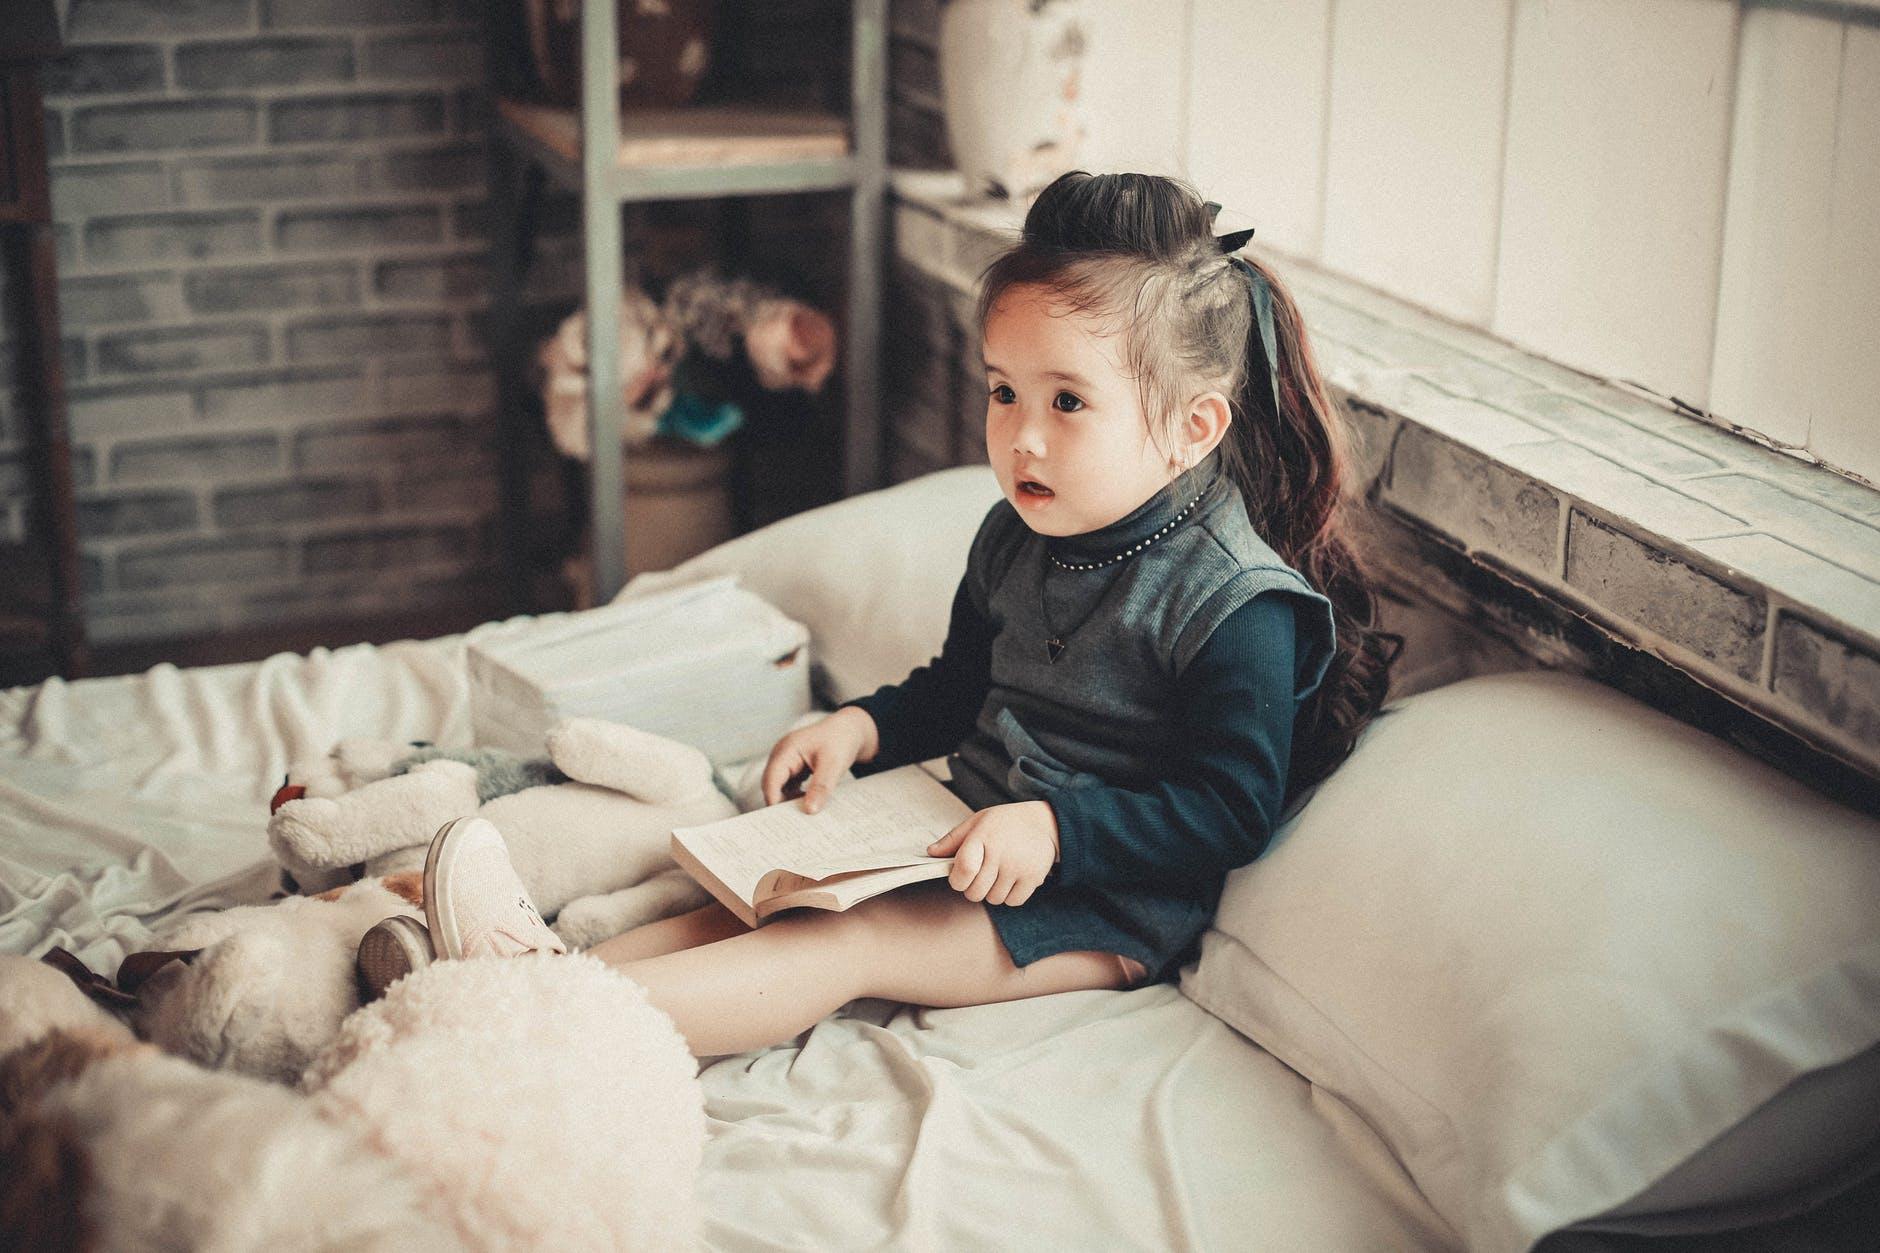 dijete krevet spavanje citanje mozak